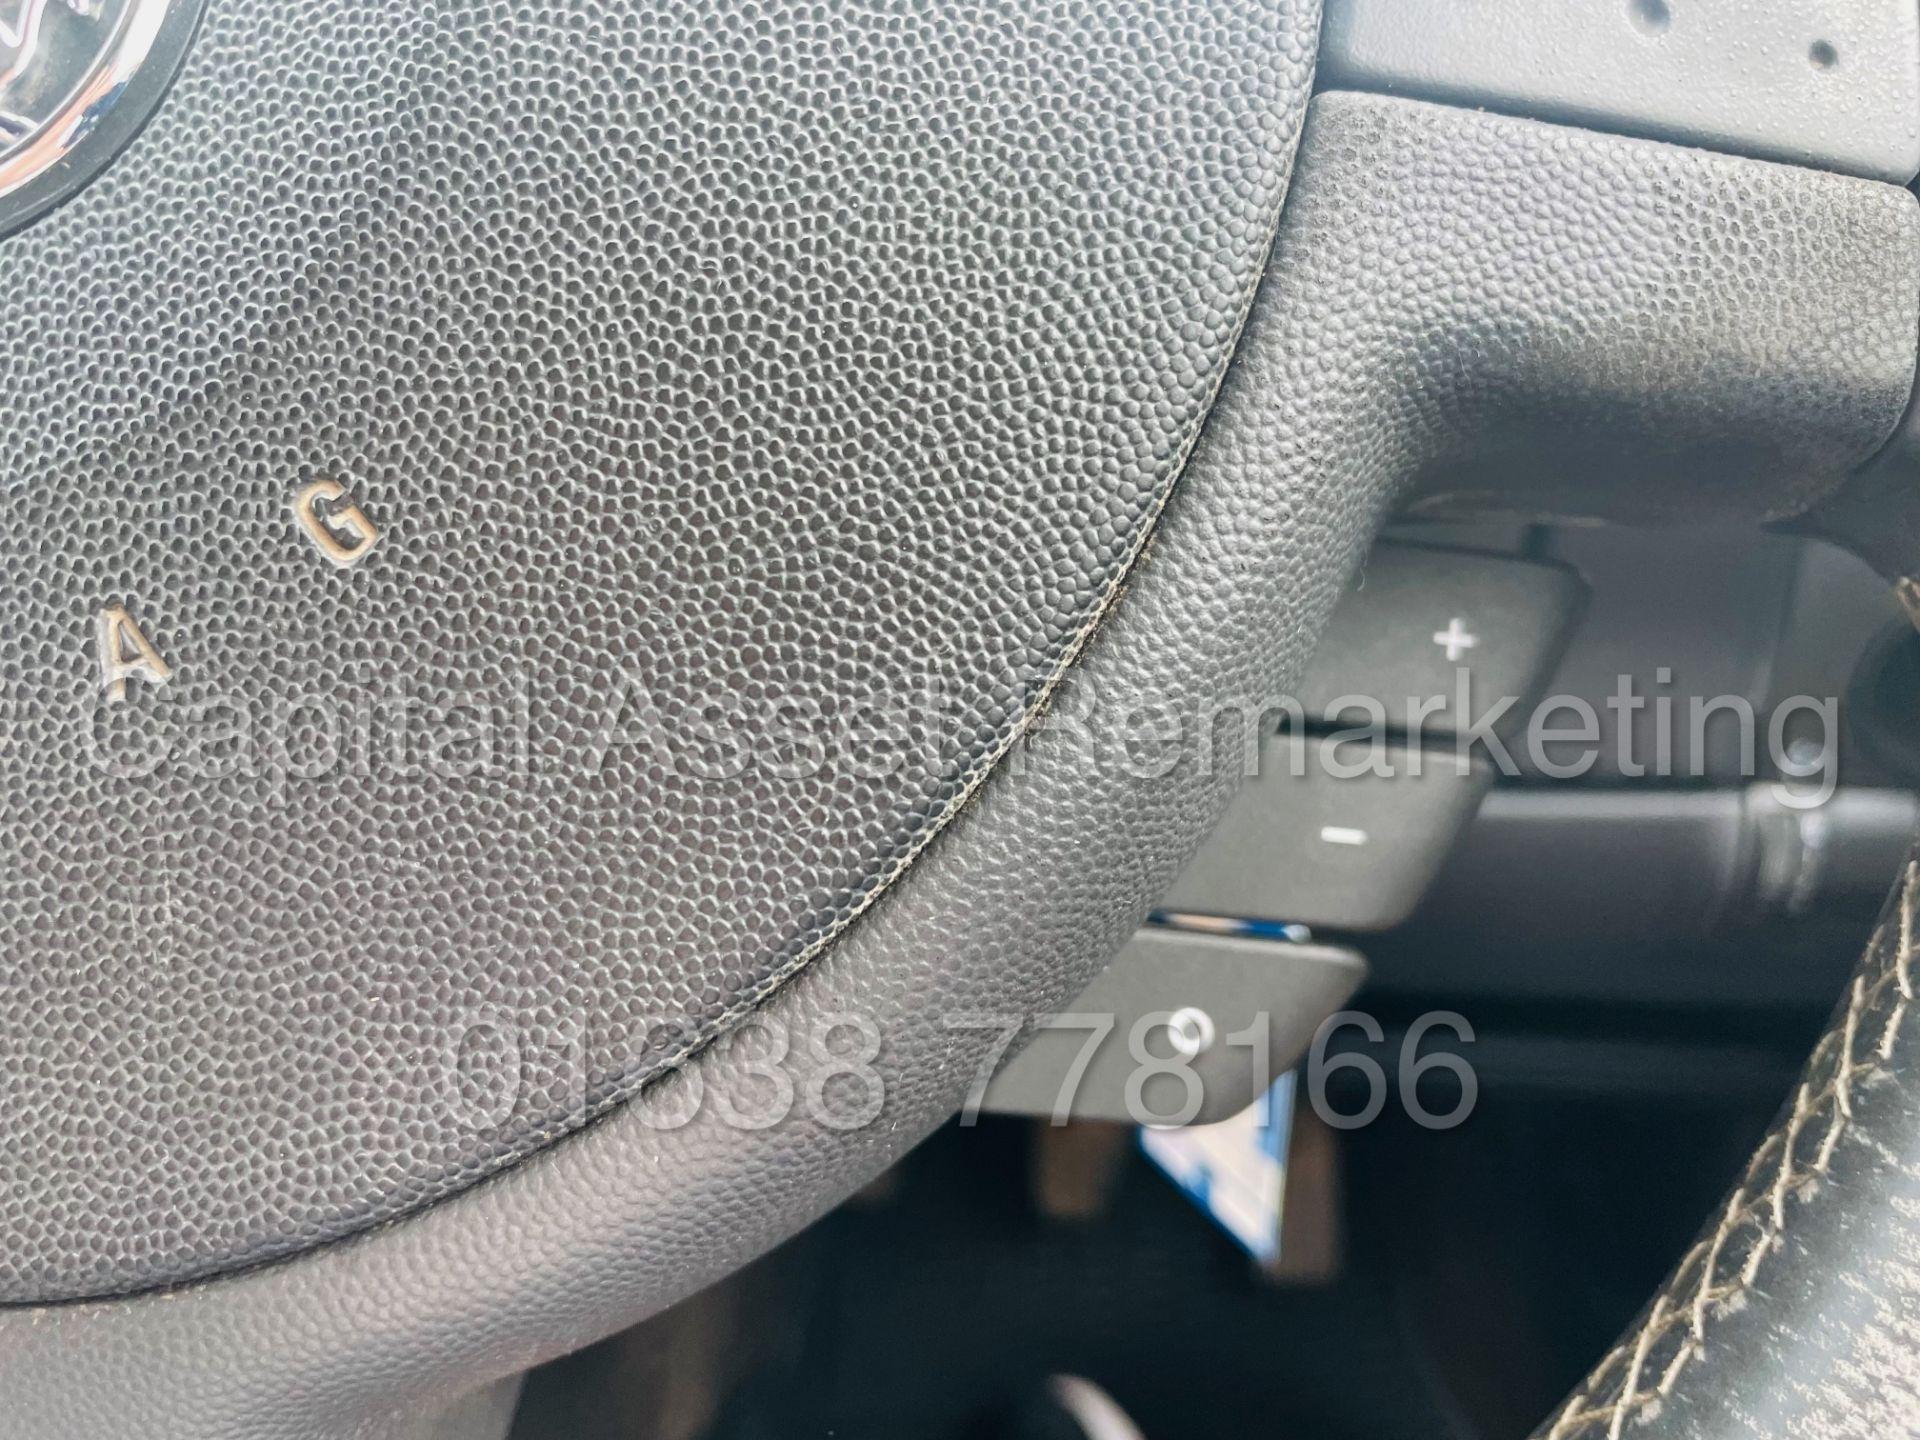 (On Sale) VAUXHALL COMBO CDTI *5 SEATER CREW VAN* (2011 - 11 REG) 'CDTI - 5 SPEED' (1 FORMER KEEPER) - Image 43 of 44